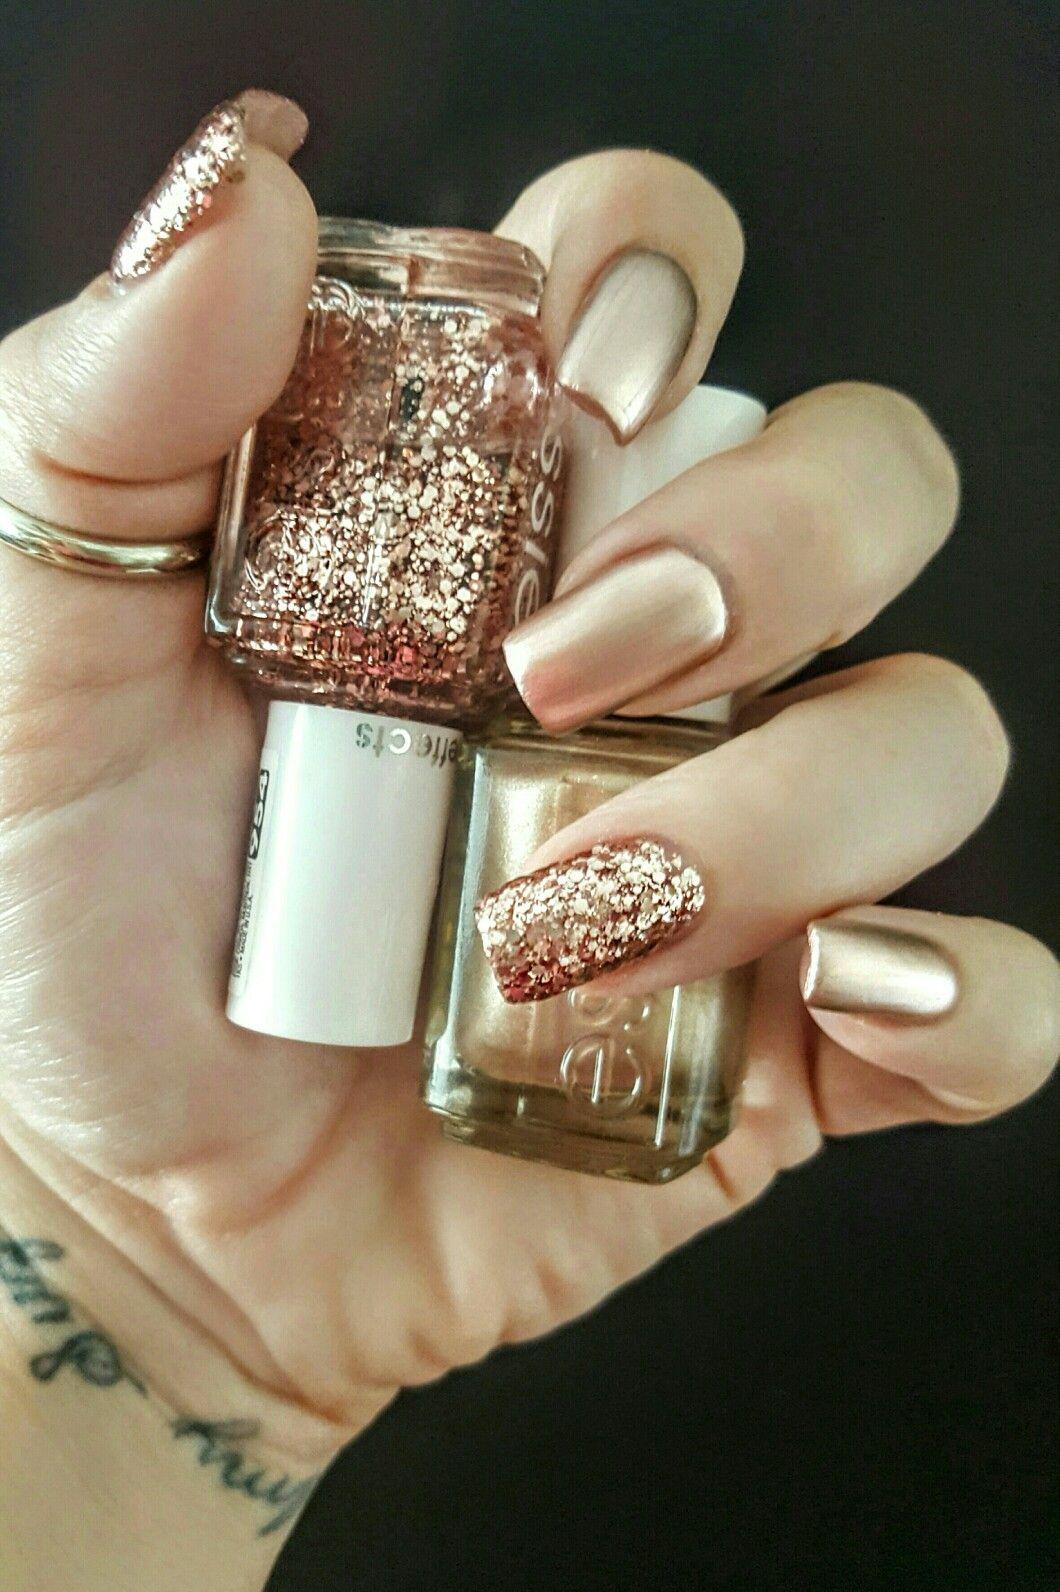 Essie-Penny talk Essie-A cut above | nailed it! | Pinterest | Nail ...